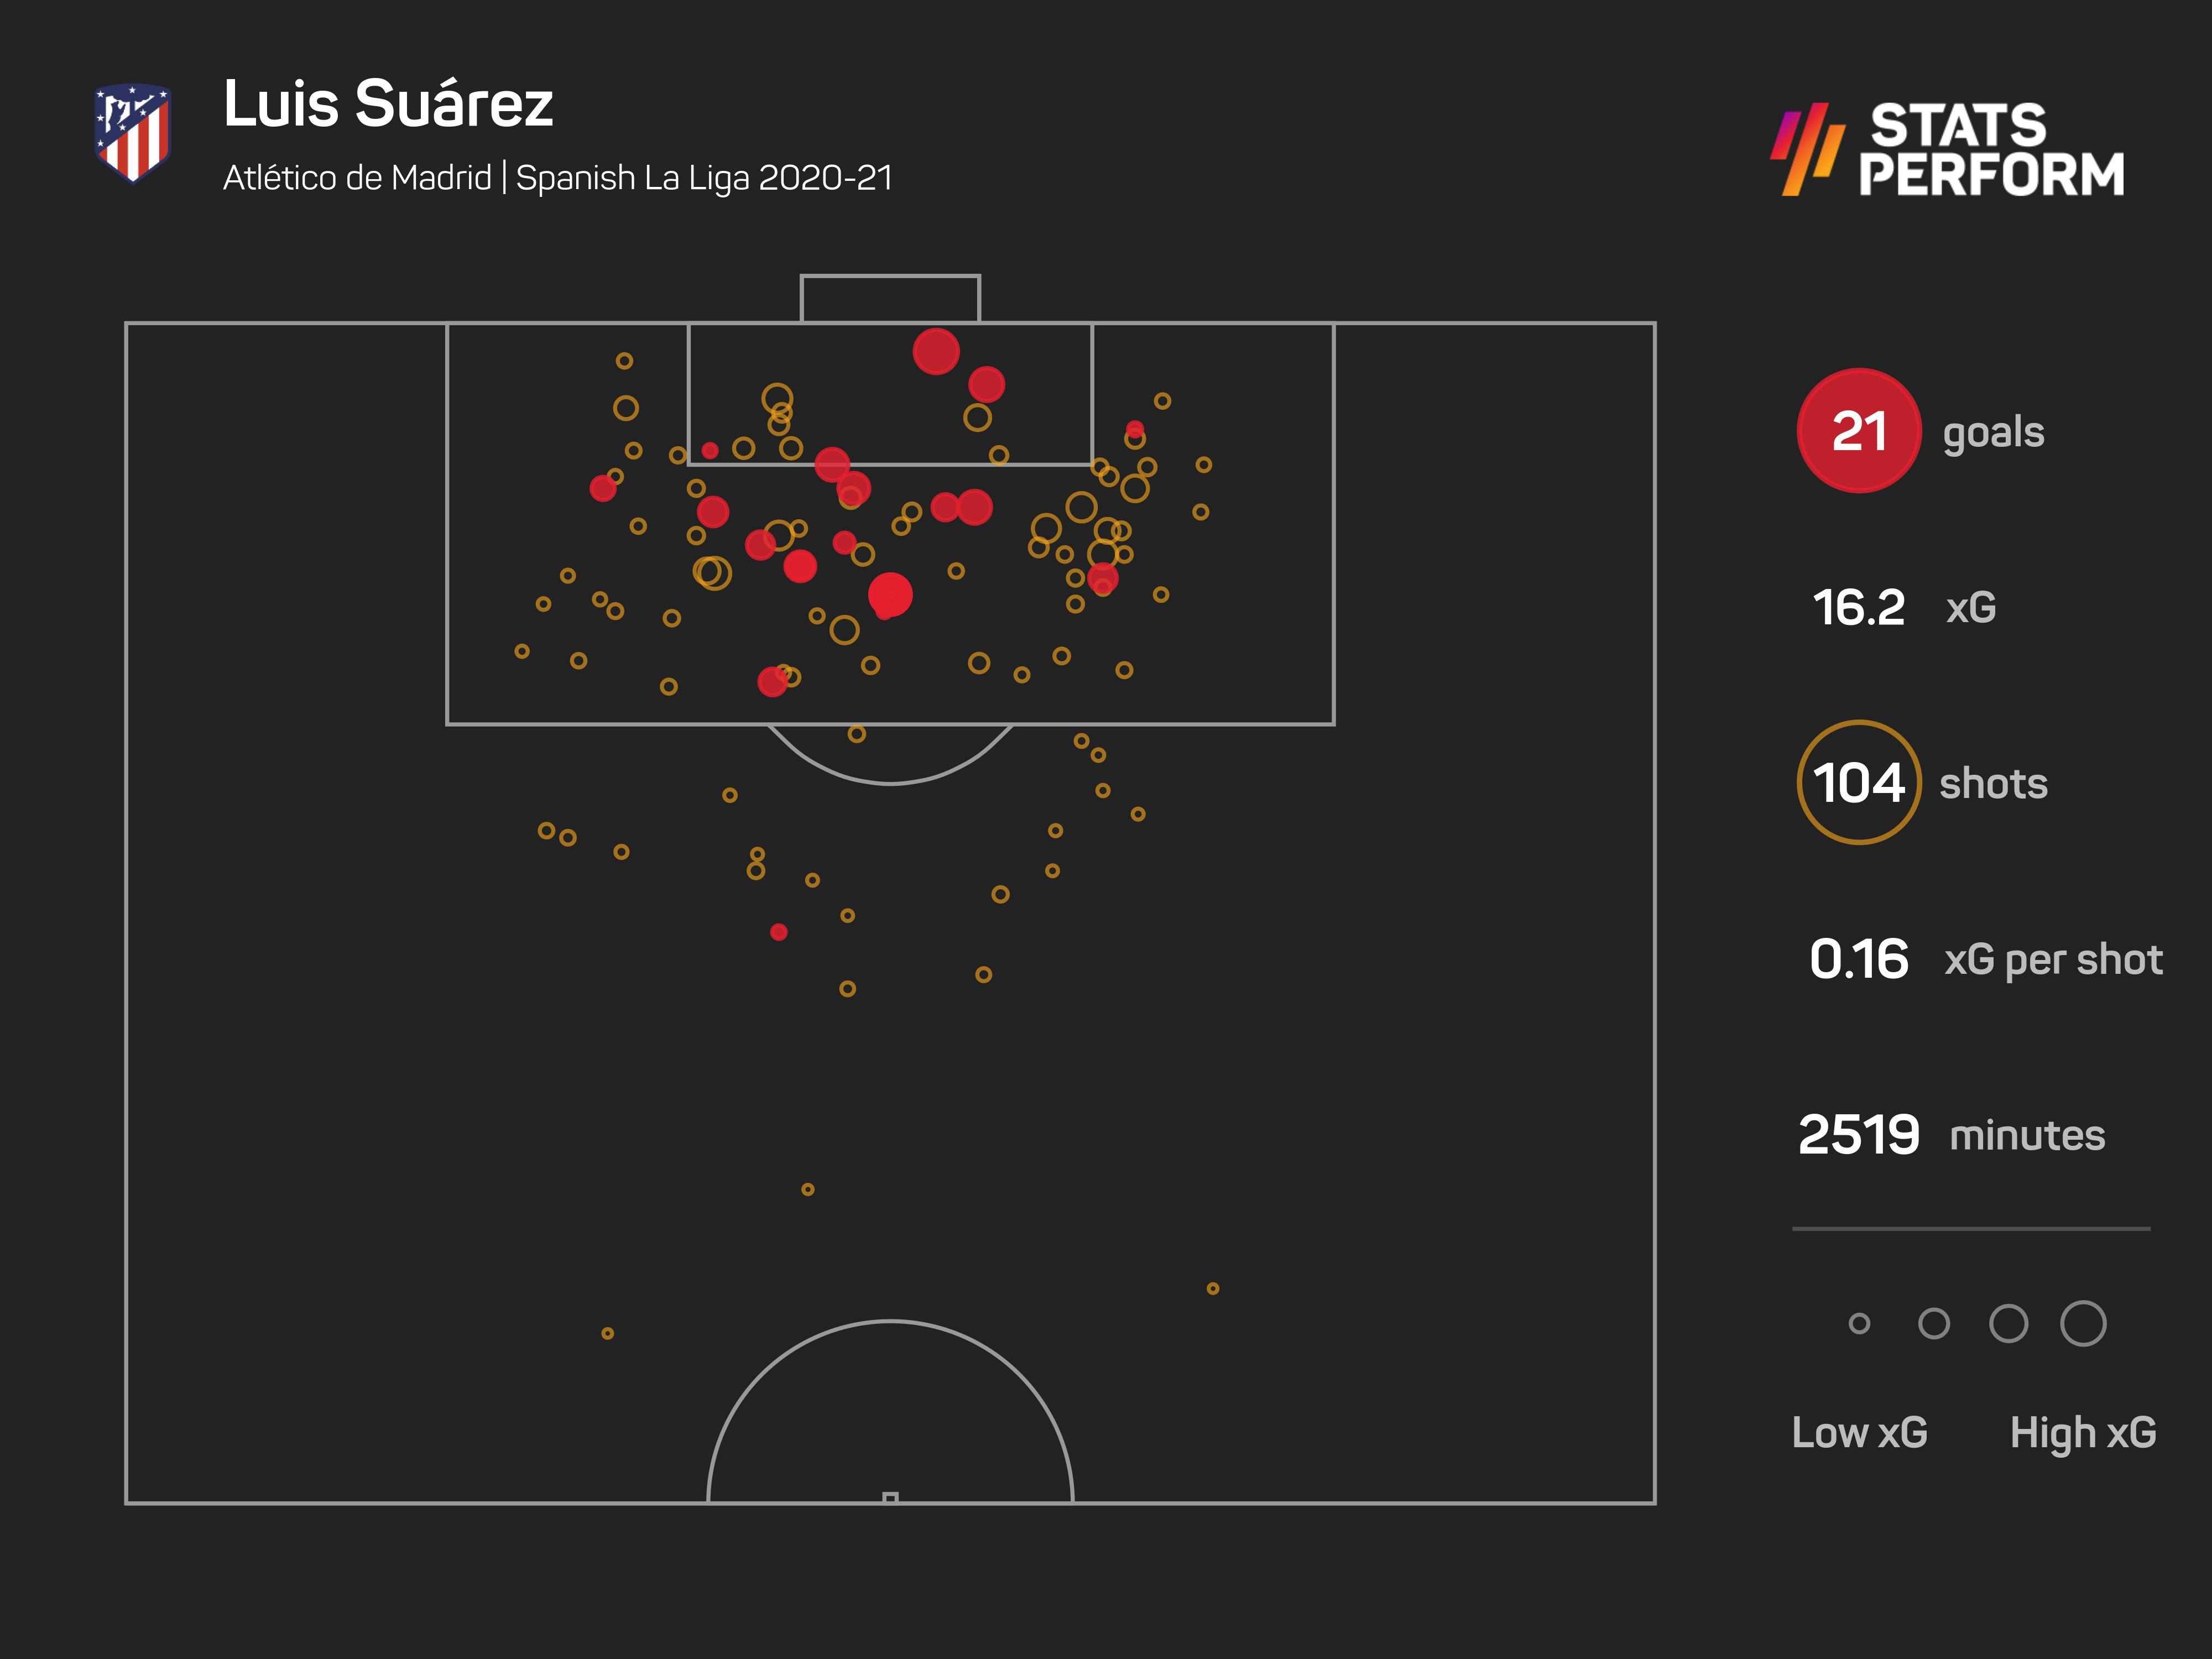 Luis Suarez xG season 2020-21